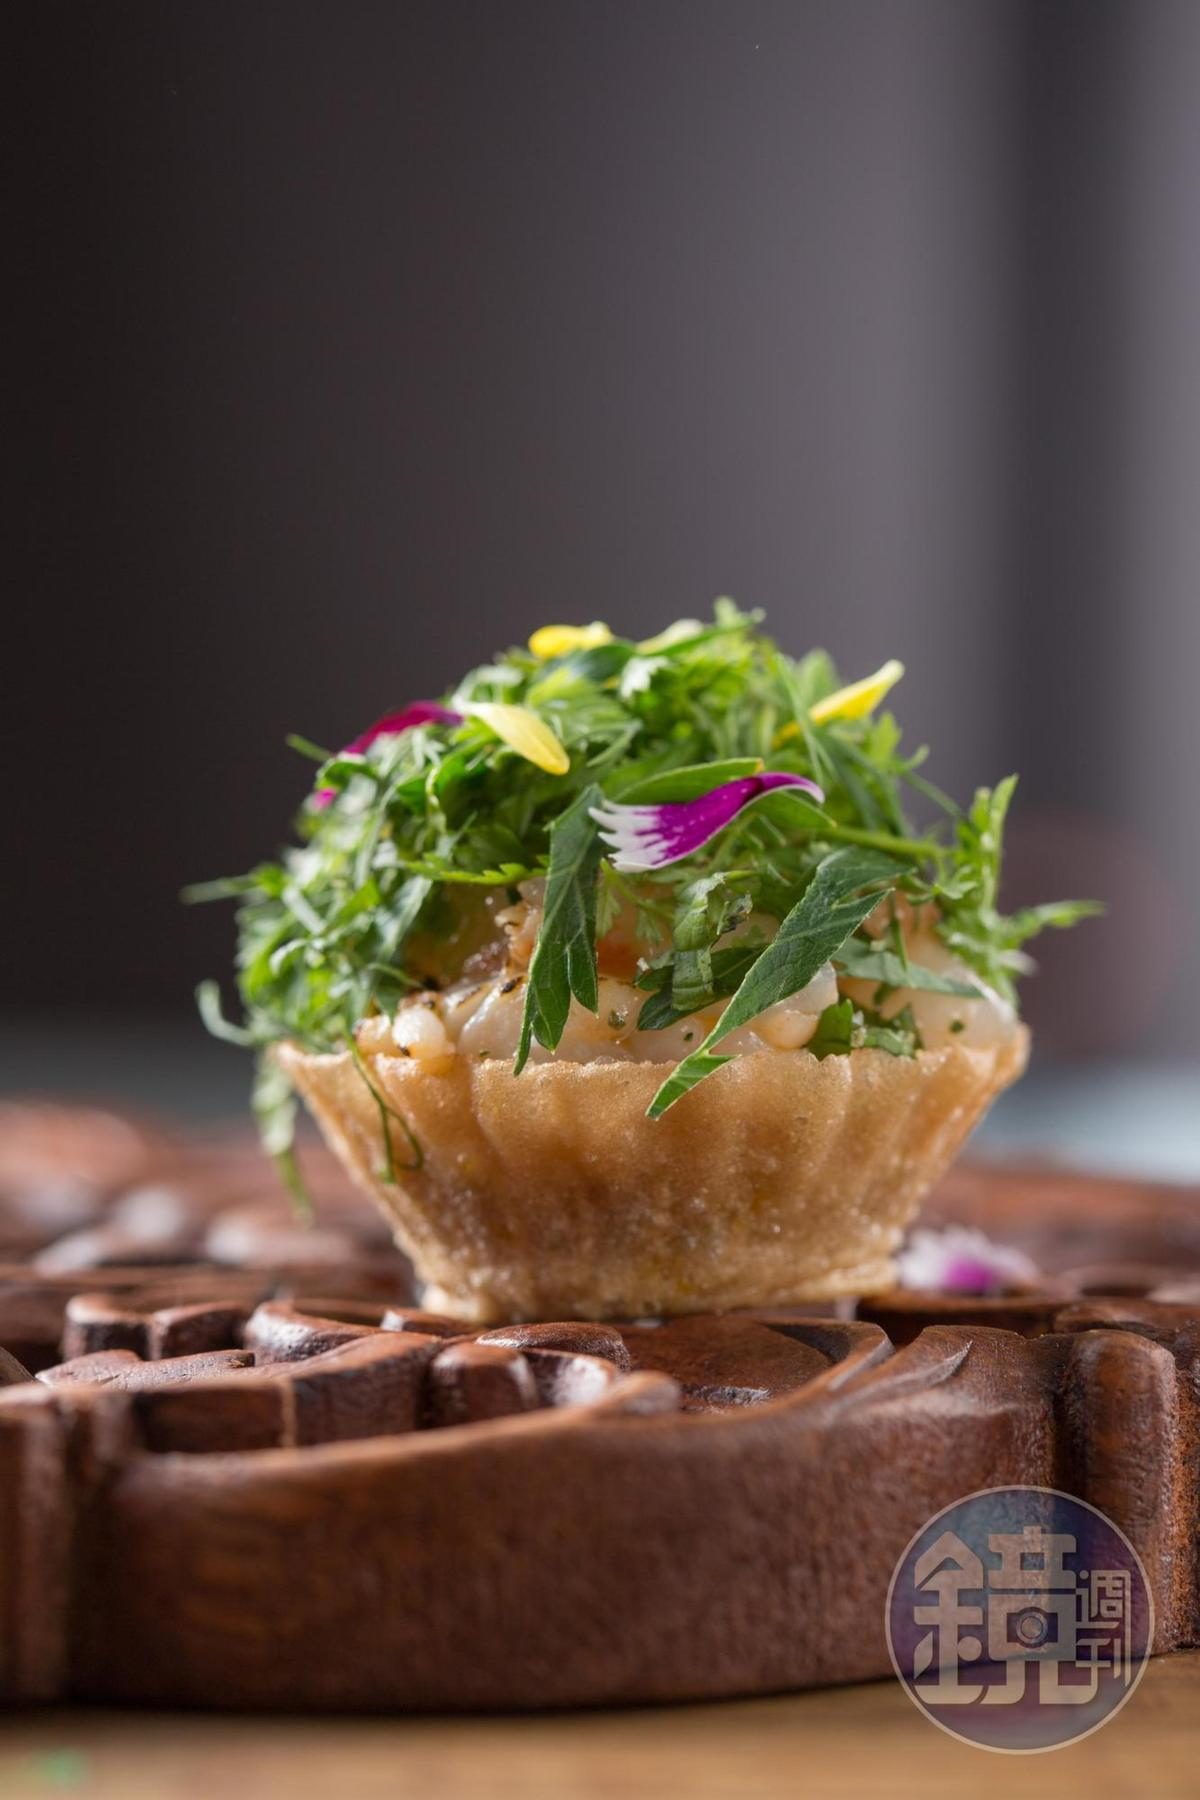 JL Studio鎮店招牌的開胃菜「杯子粿」(Kueh Pie Tee)是結合馬來香料與華人手法烹調的「娘惹菜」。